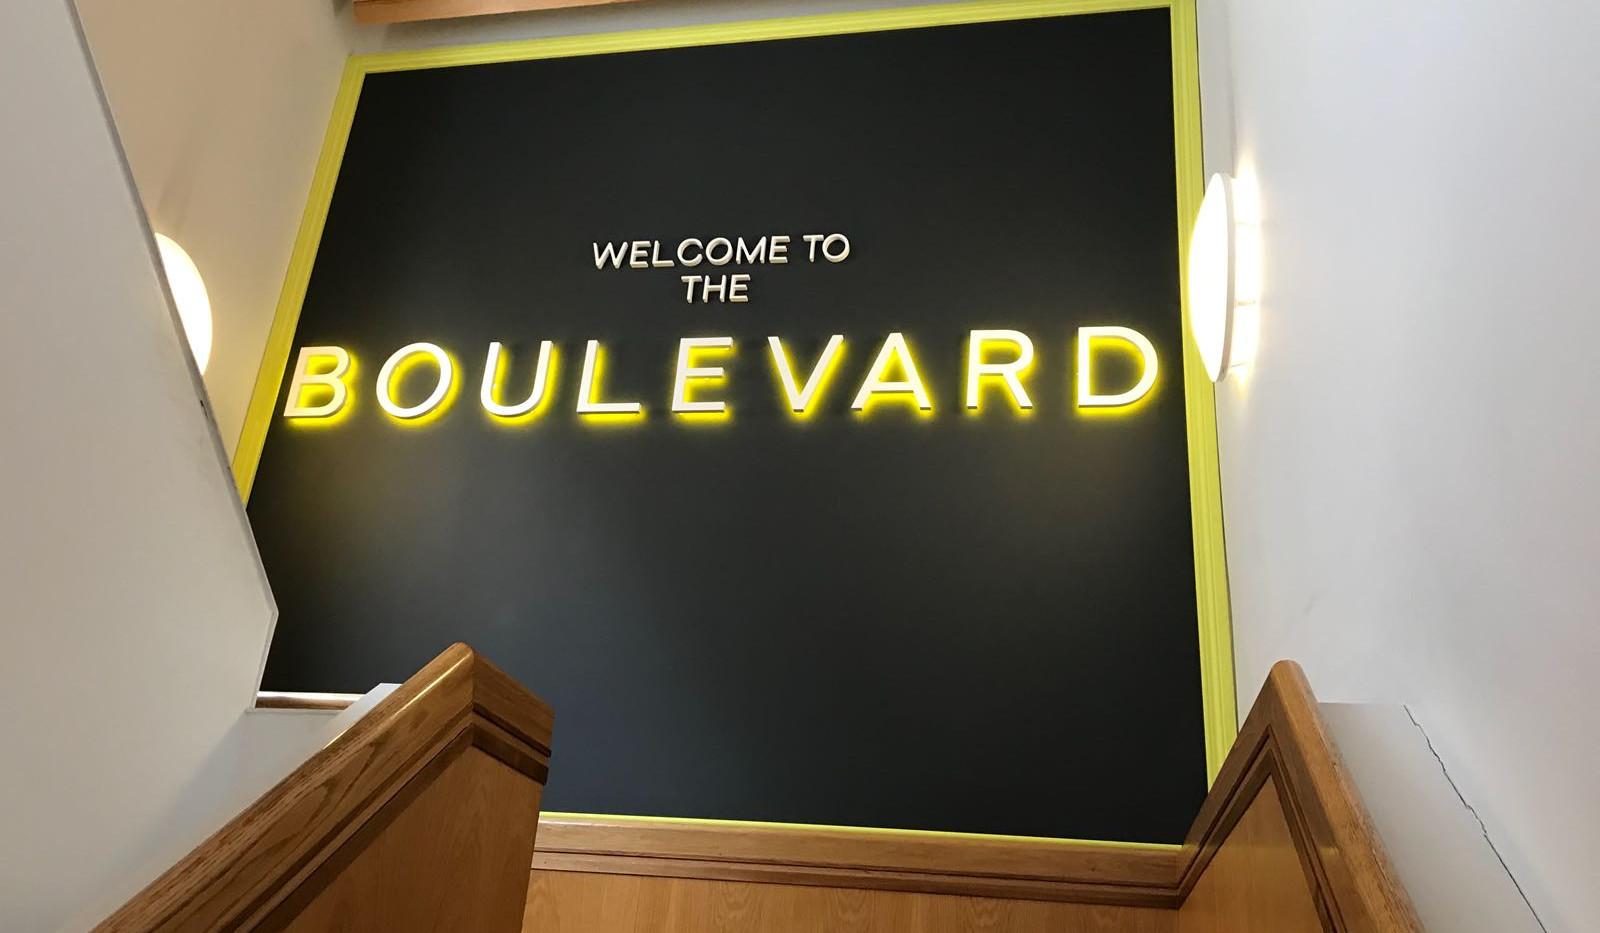 Boulevard 2.JPG